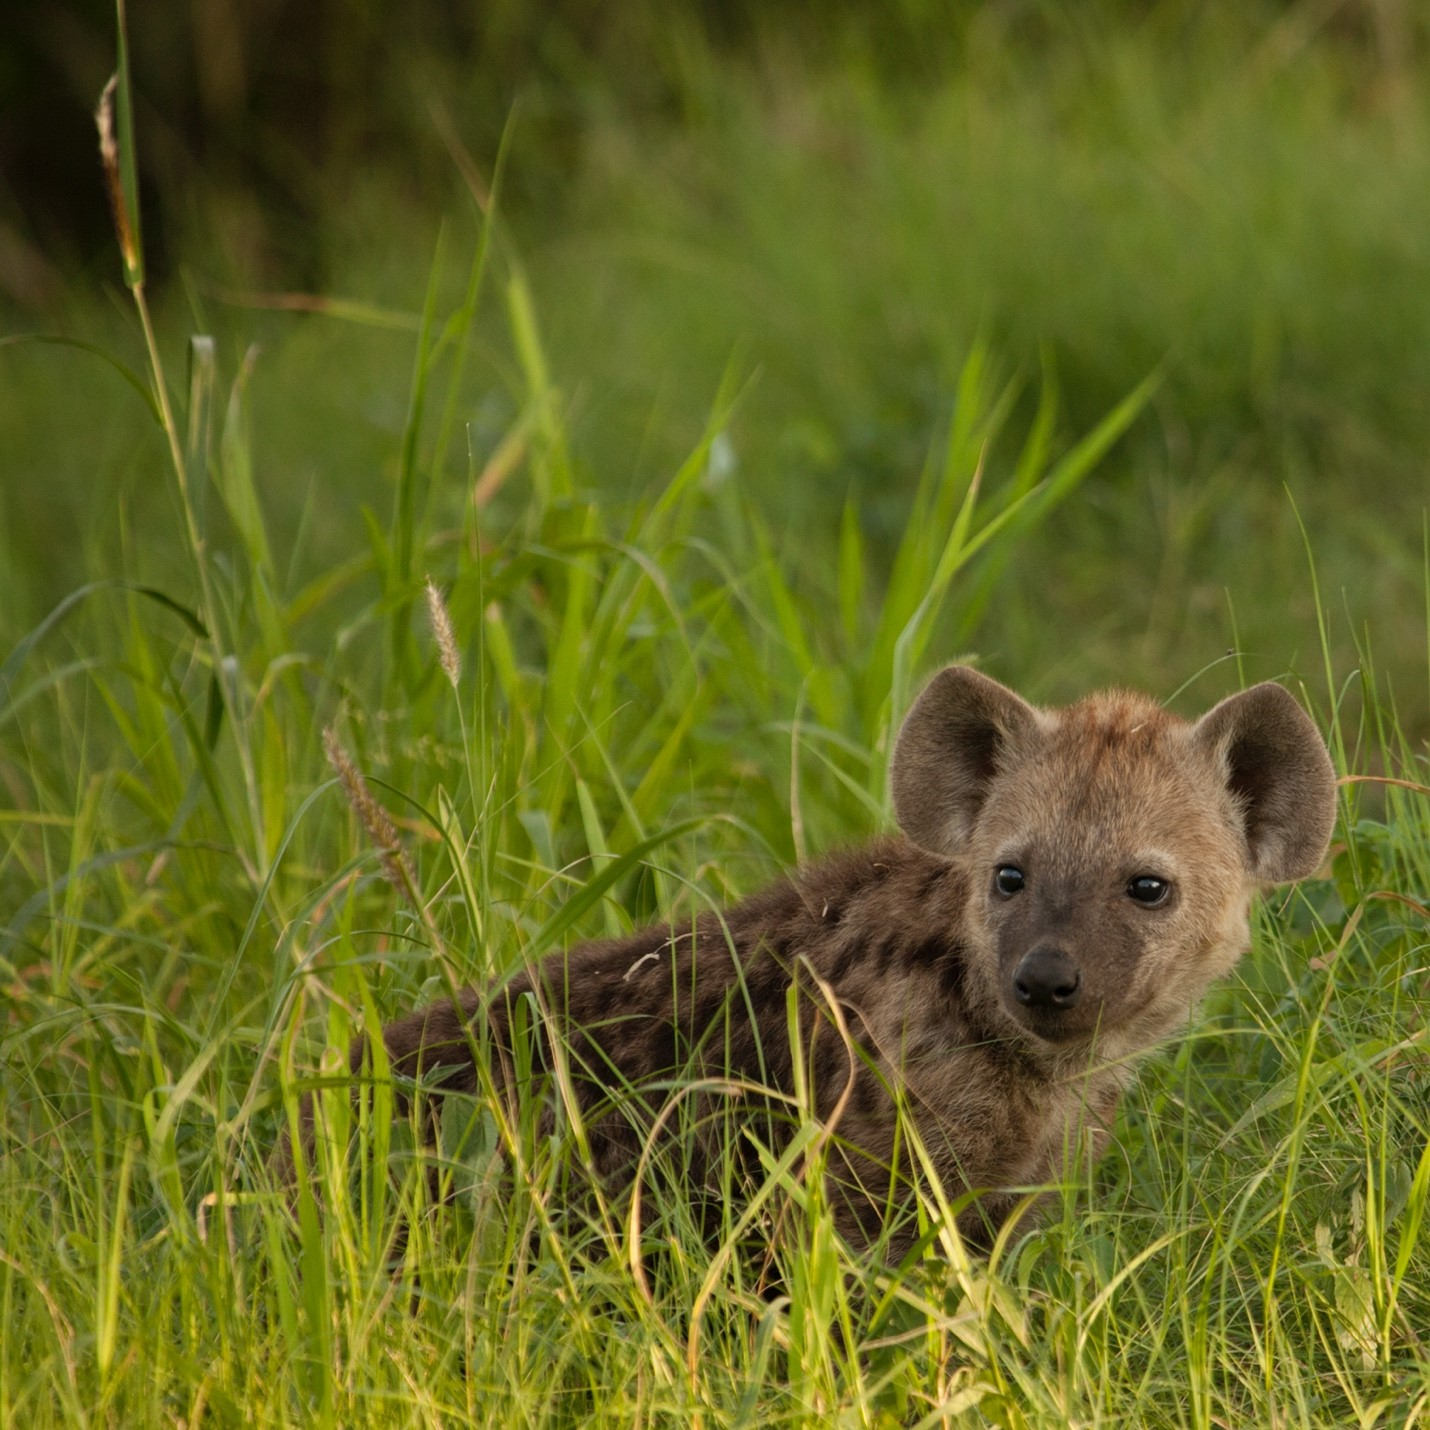 a baby hyena poses in the grass in botswana's okavango delta